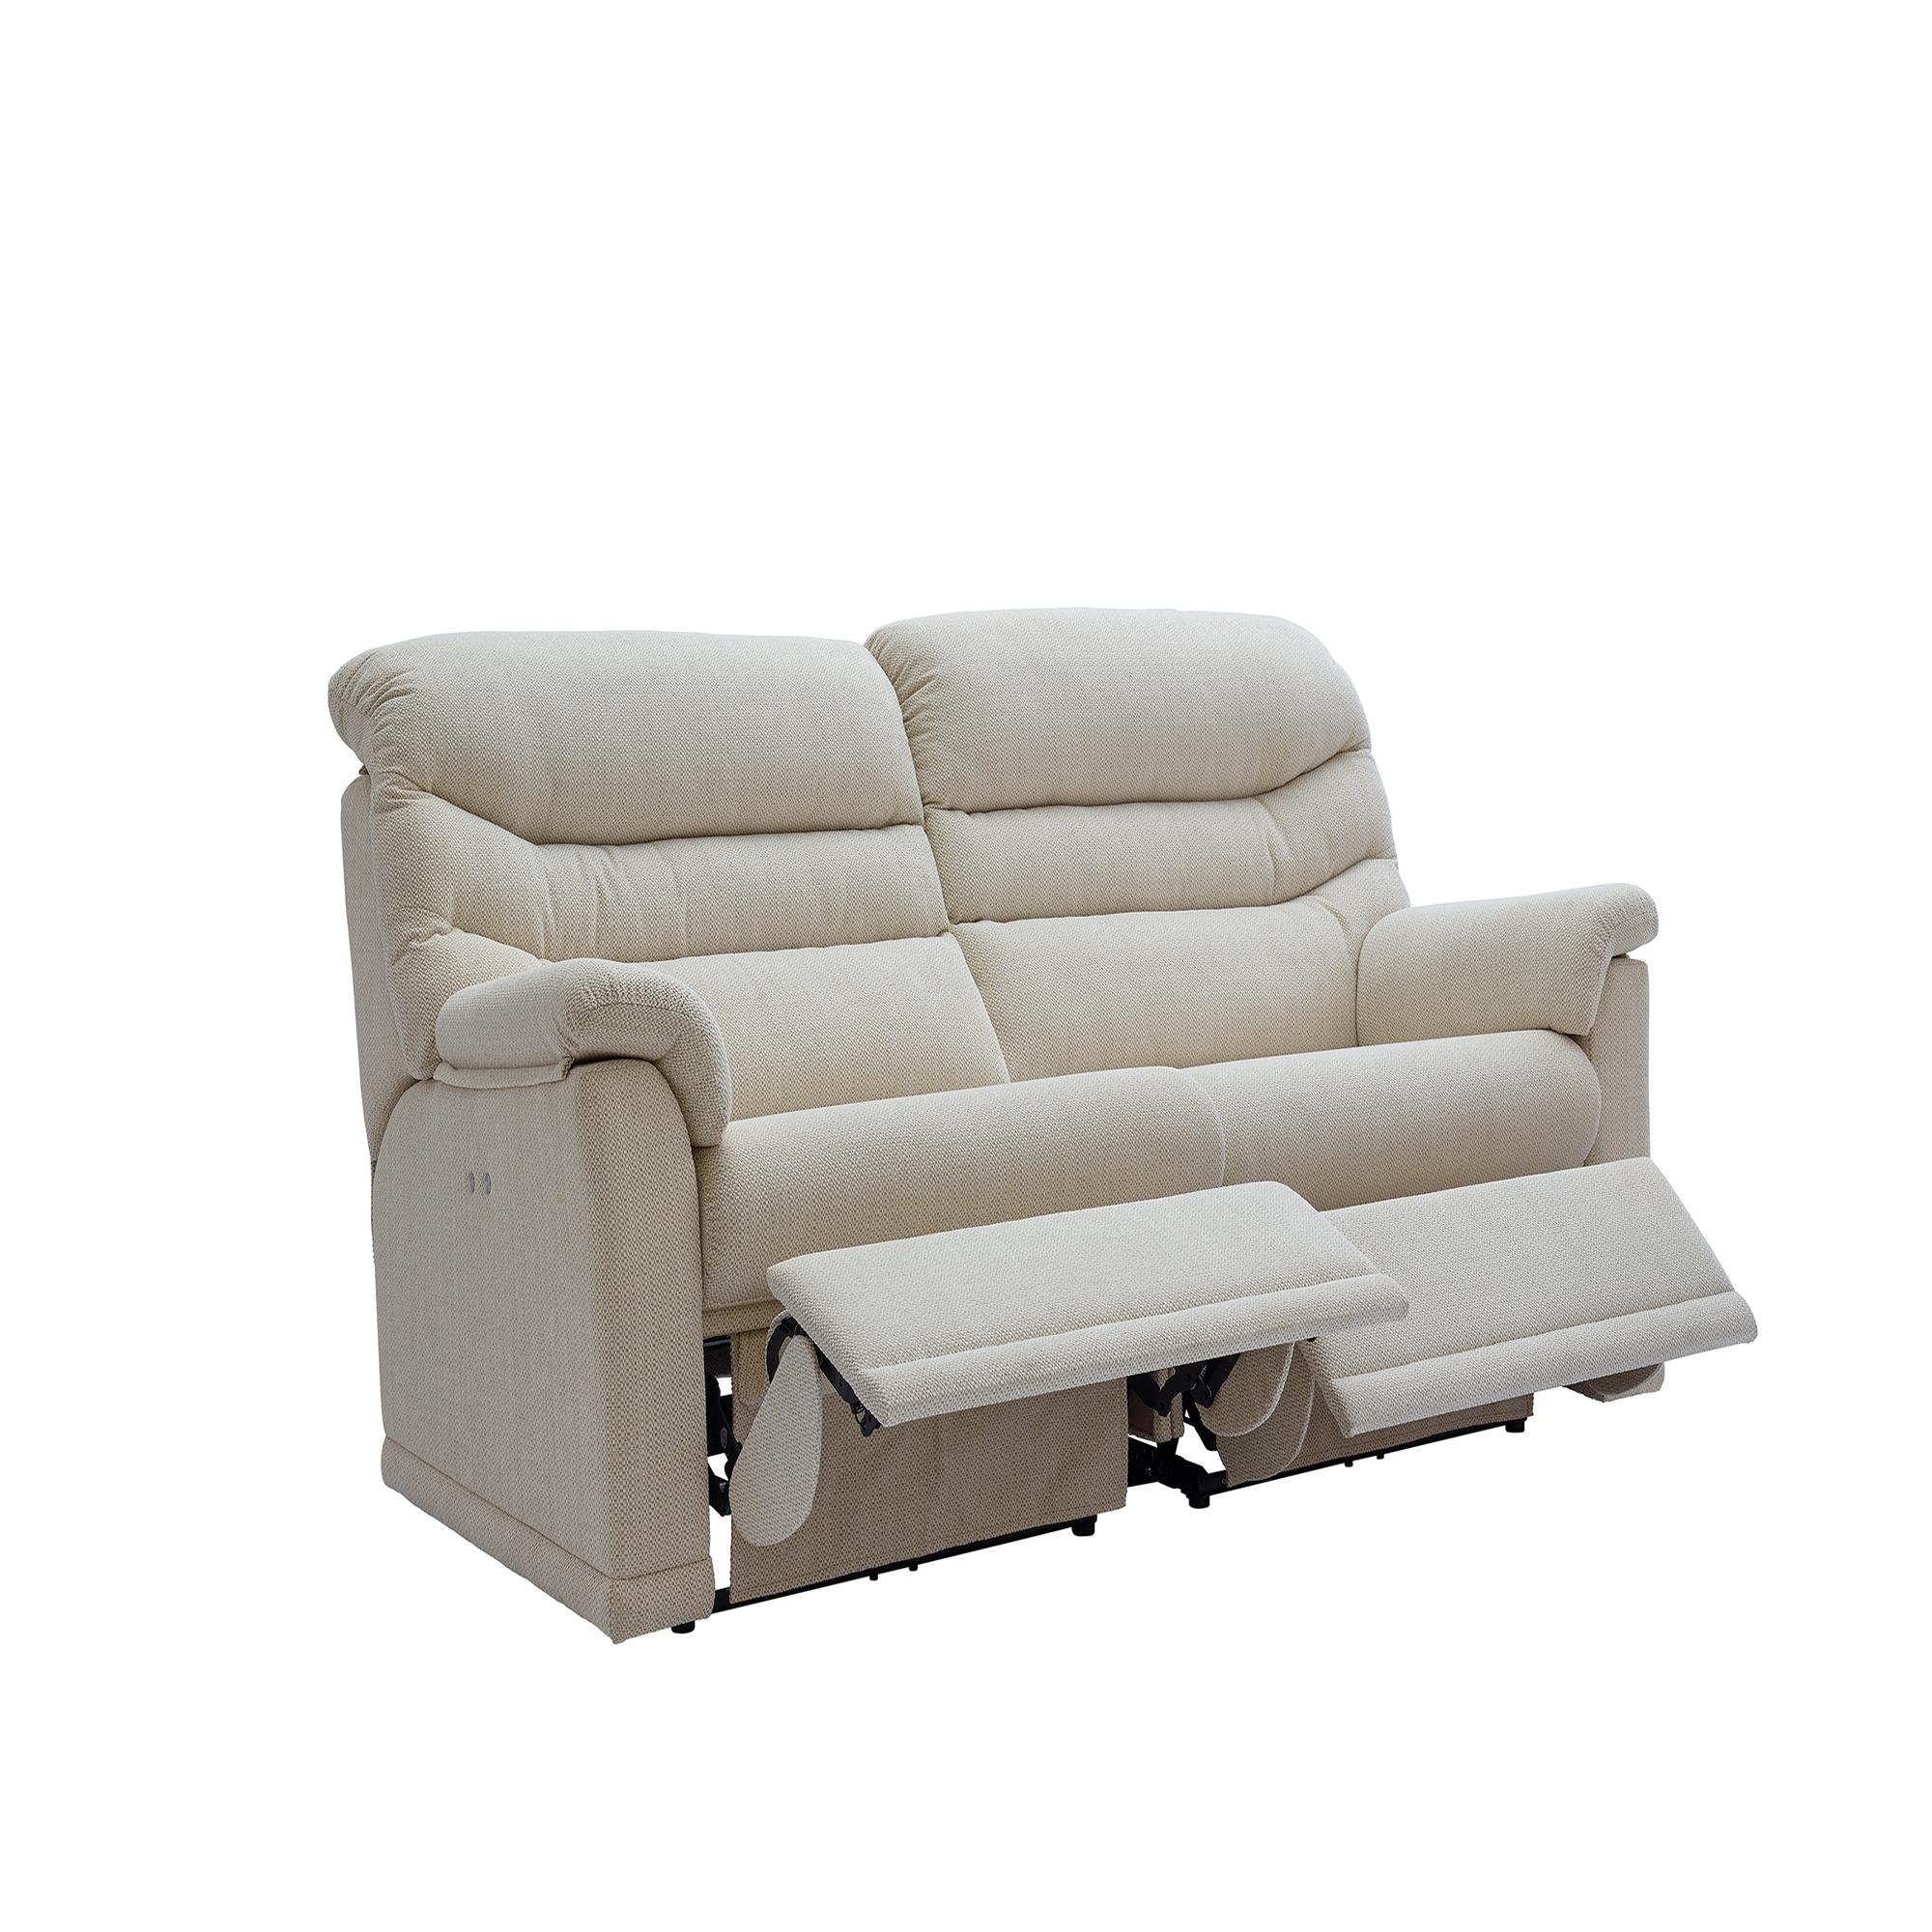 G Plan Malvern 2 Seater Double Power Recliner Sofa All Sofas